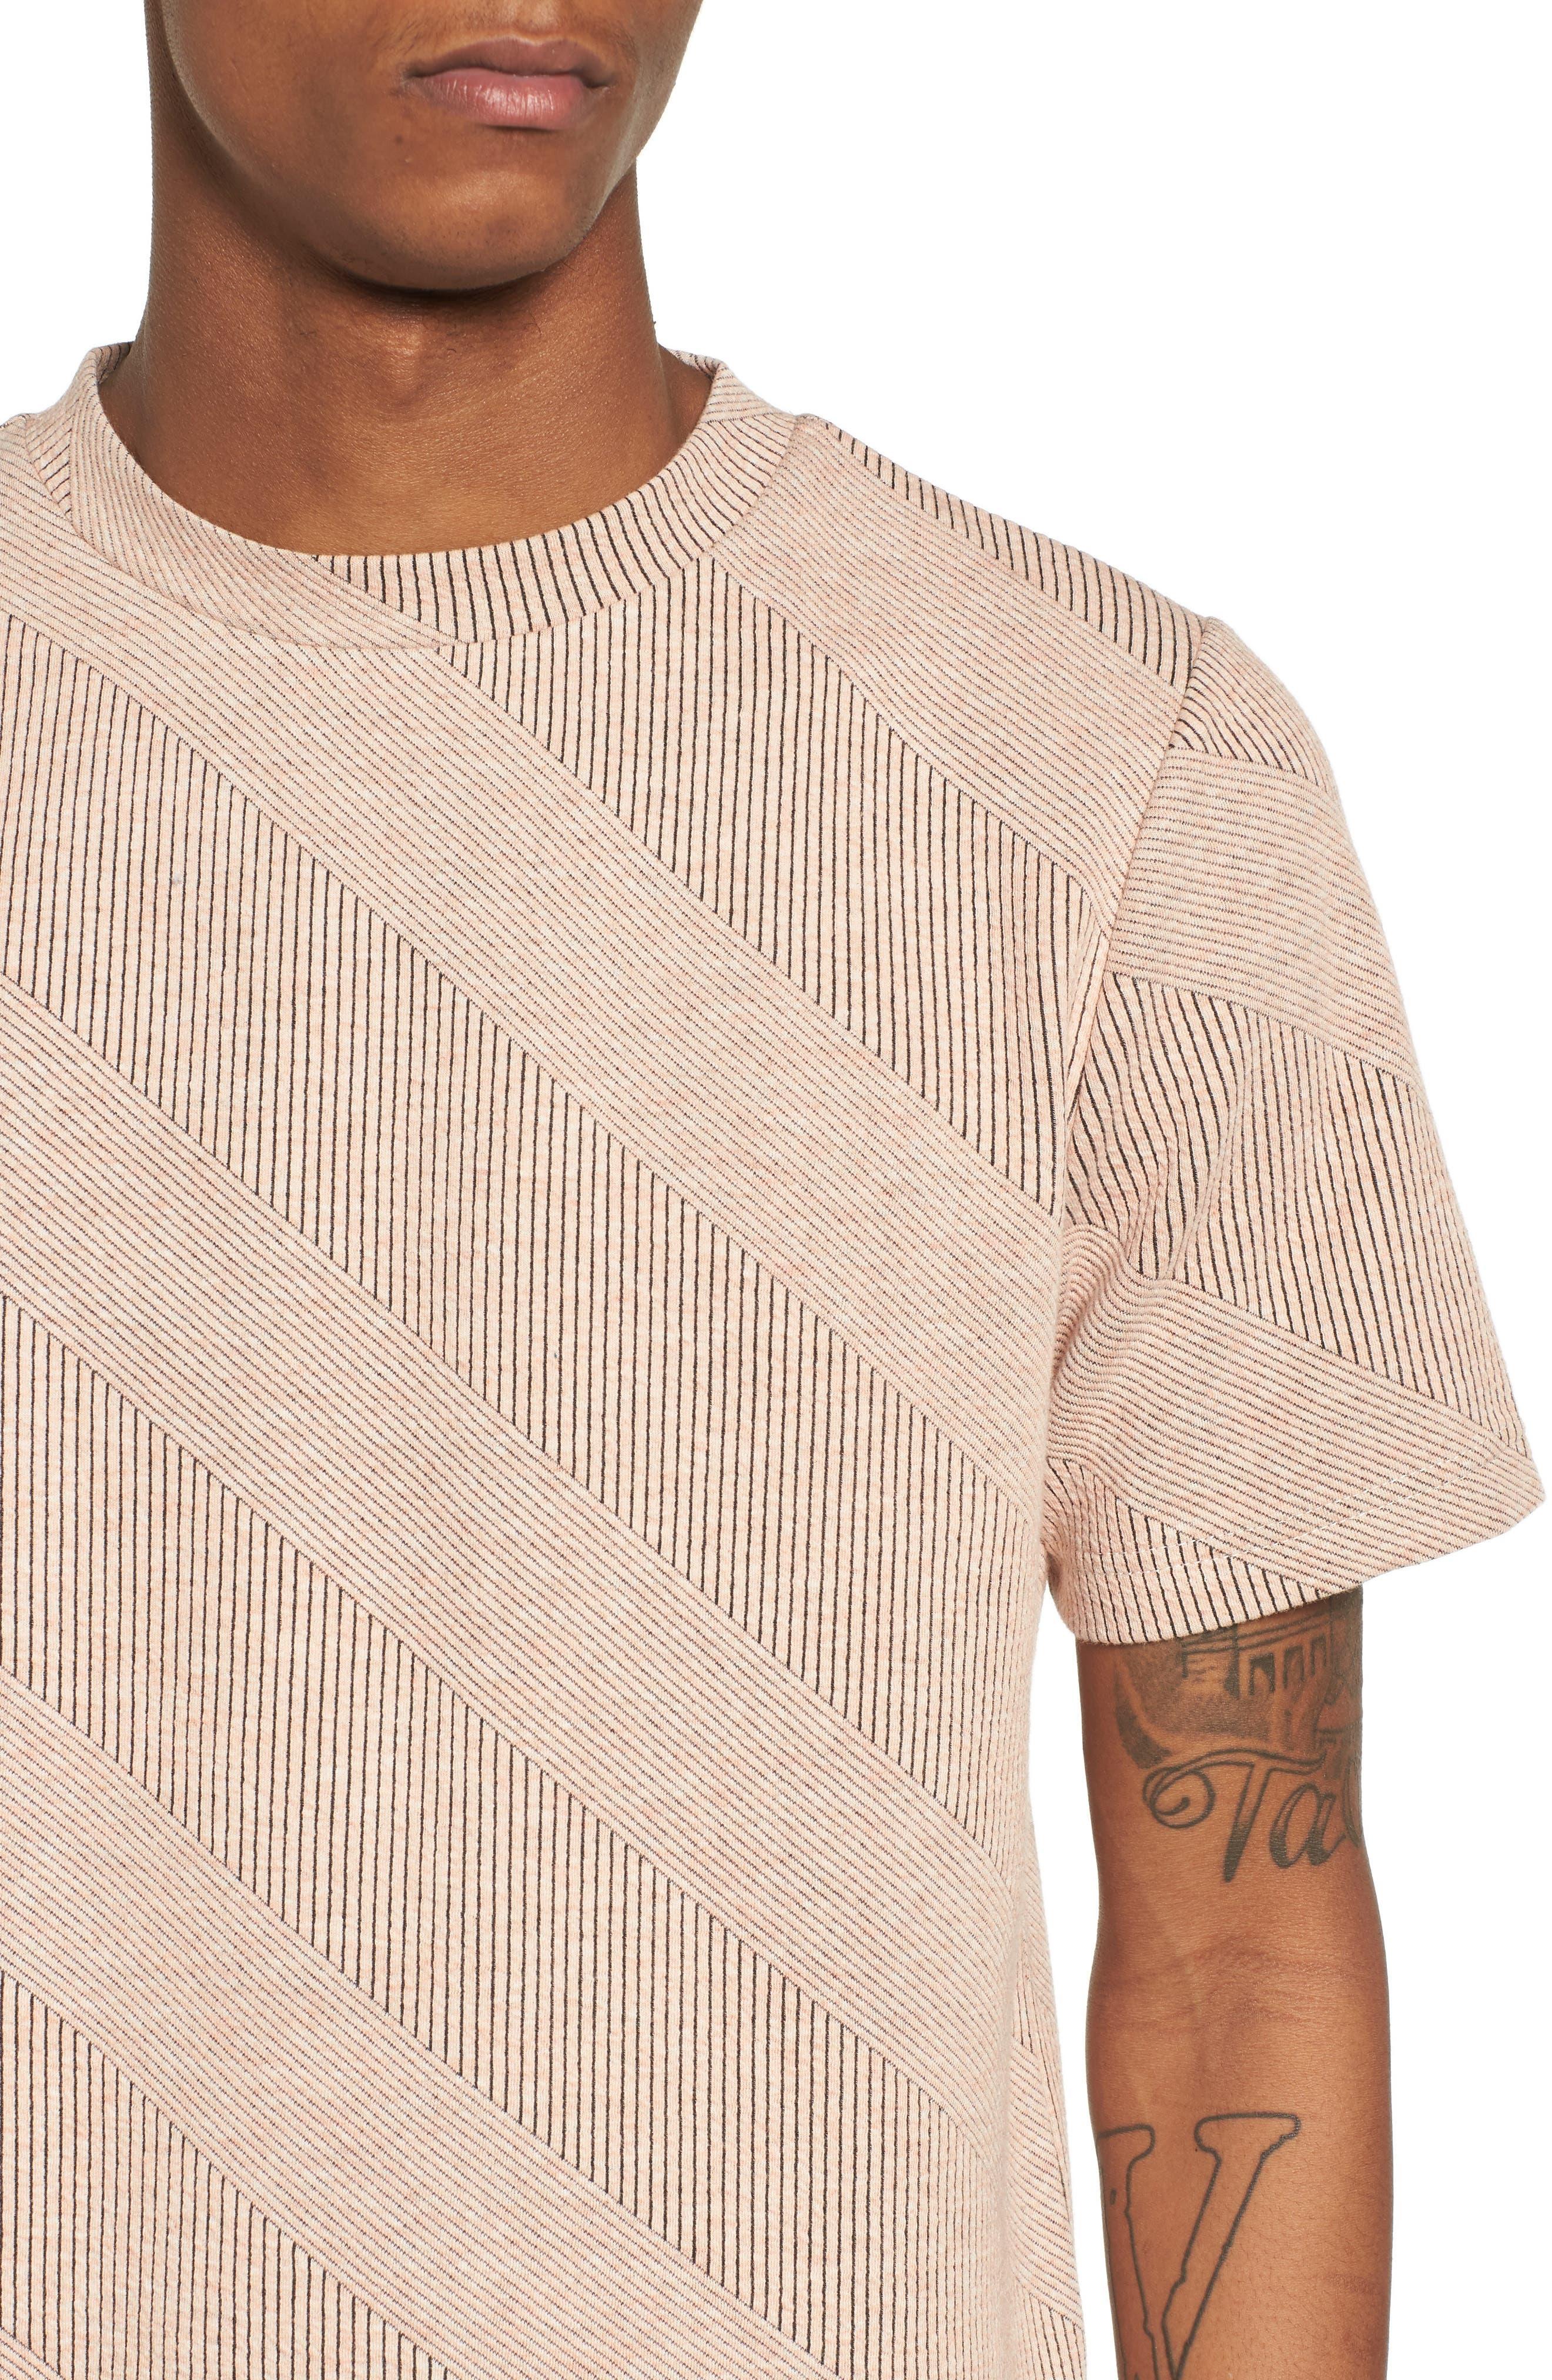 Biota T-Shirt,                             Alternate thumbnail 4, color,                             Coral